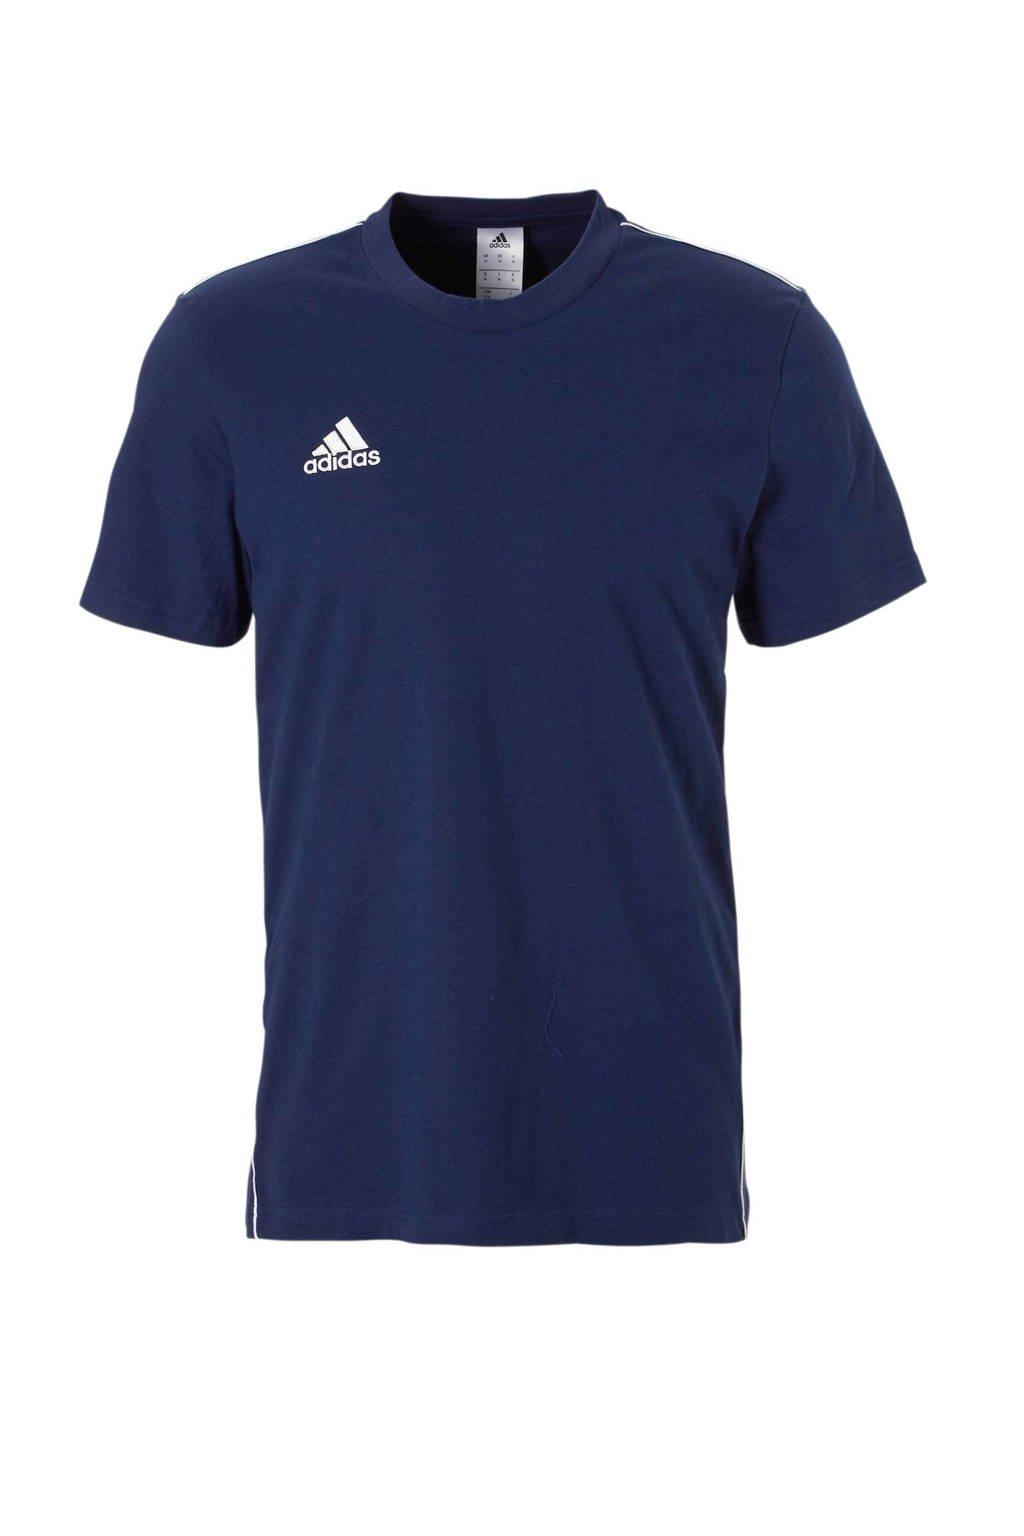 adidas performance   Core 18 sport T-shirt donkerblauw, Donkerblauw/wit